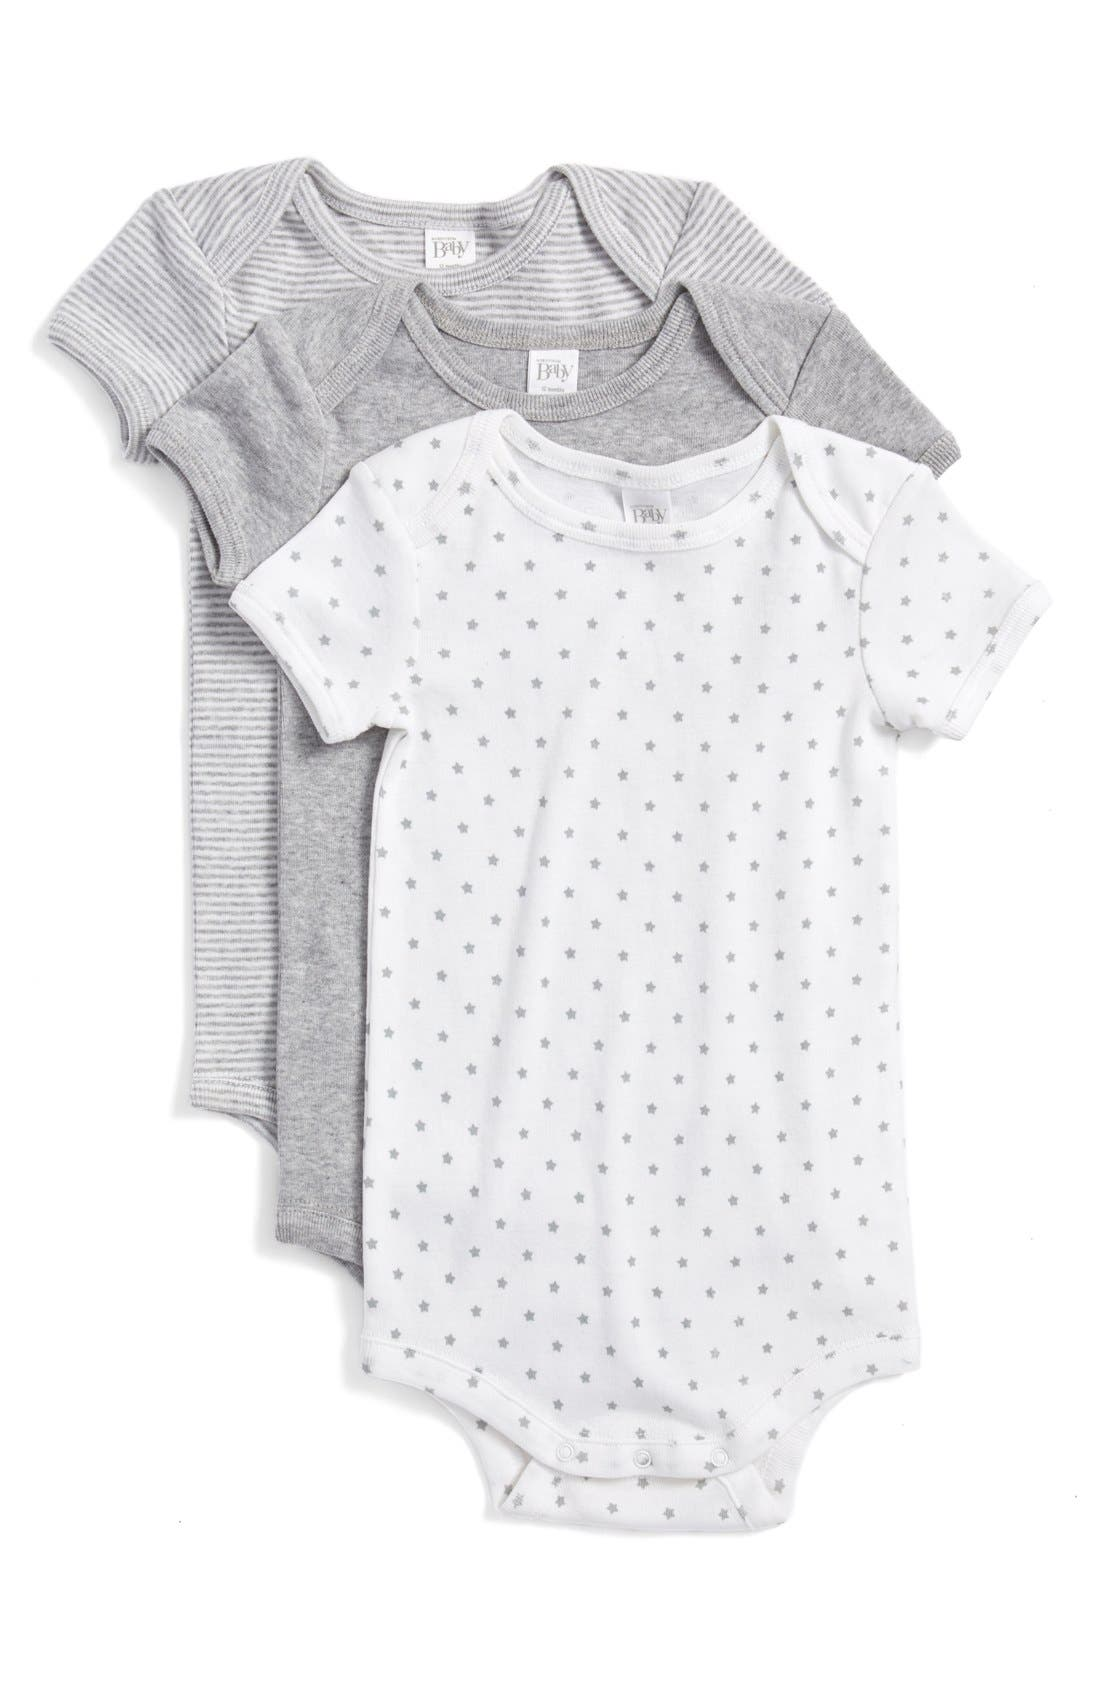 NORDSTROM BABY Cotton Bodysuits